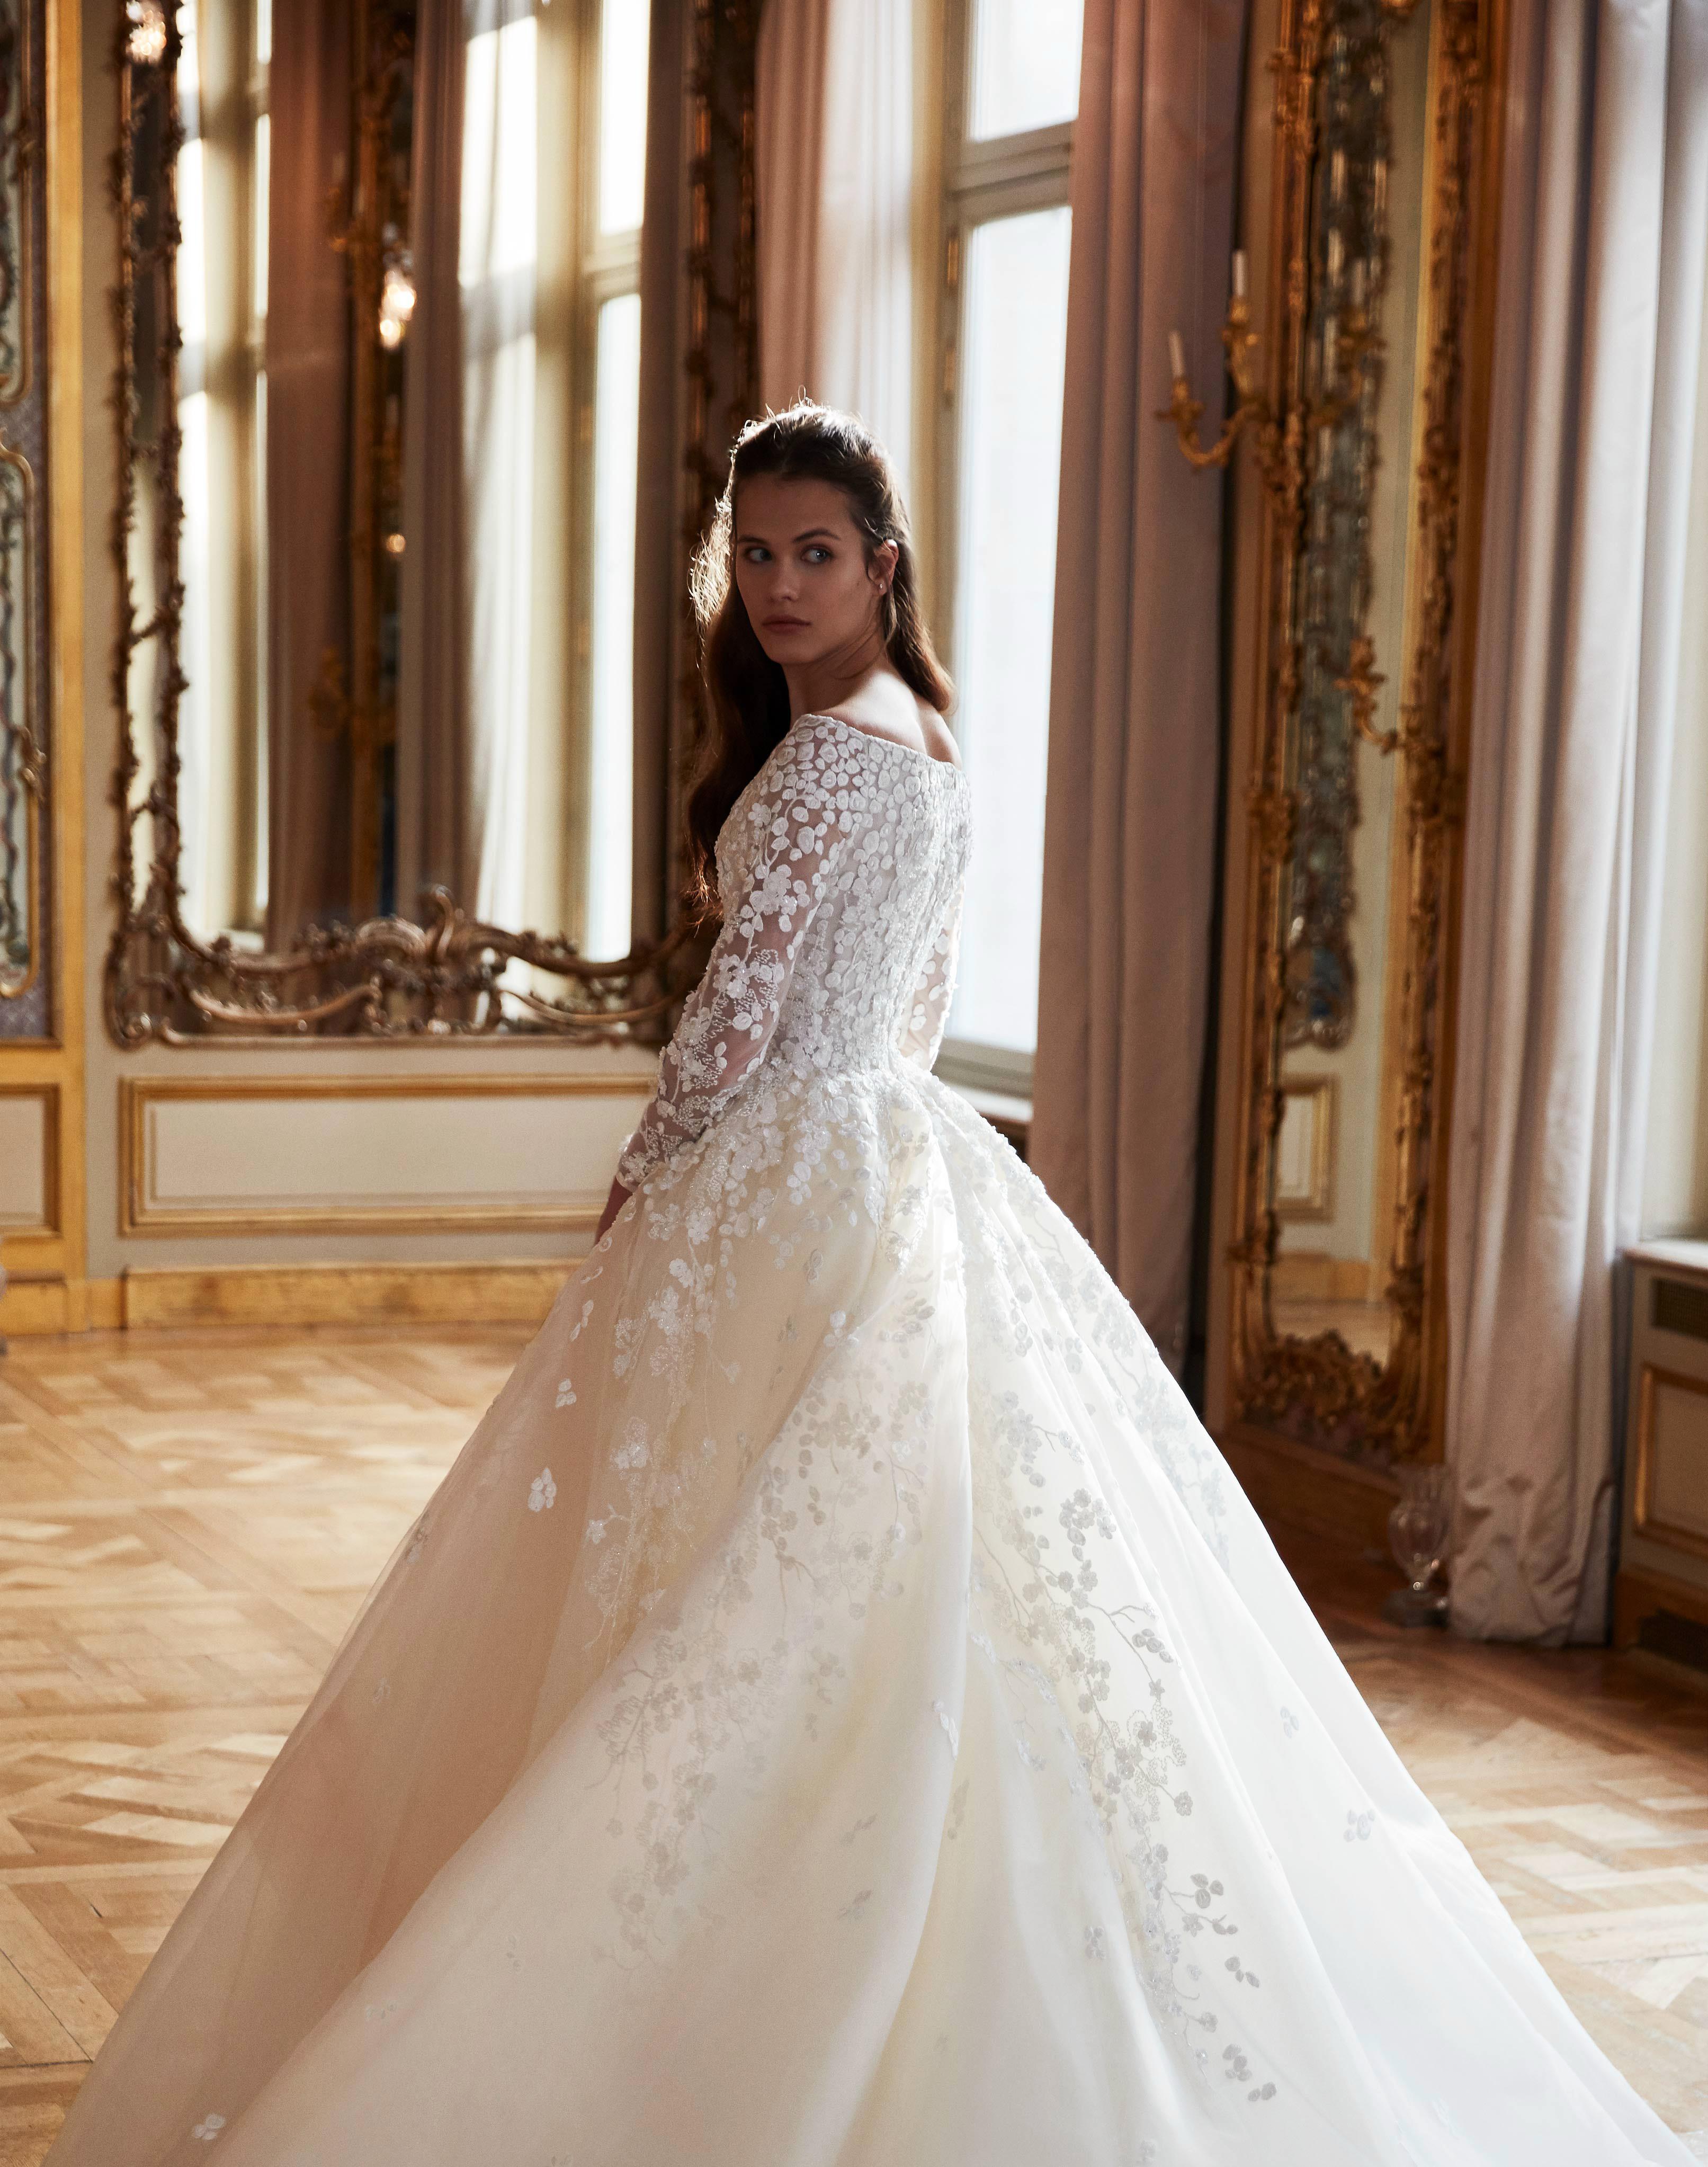 elie saab wedding dress spring 2019 ballgown long sleeves embroidered